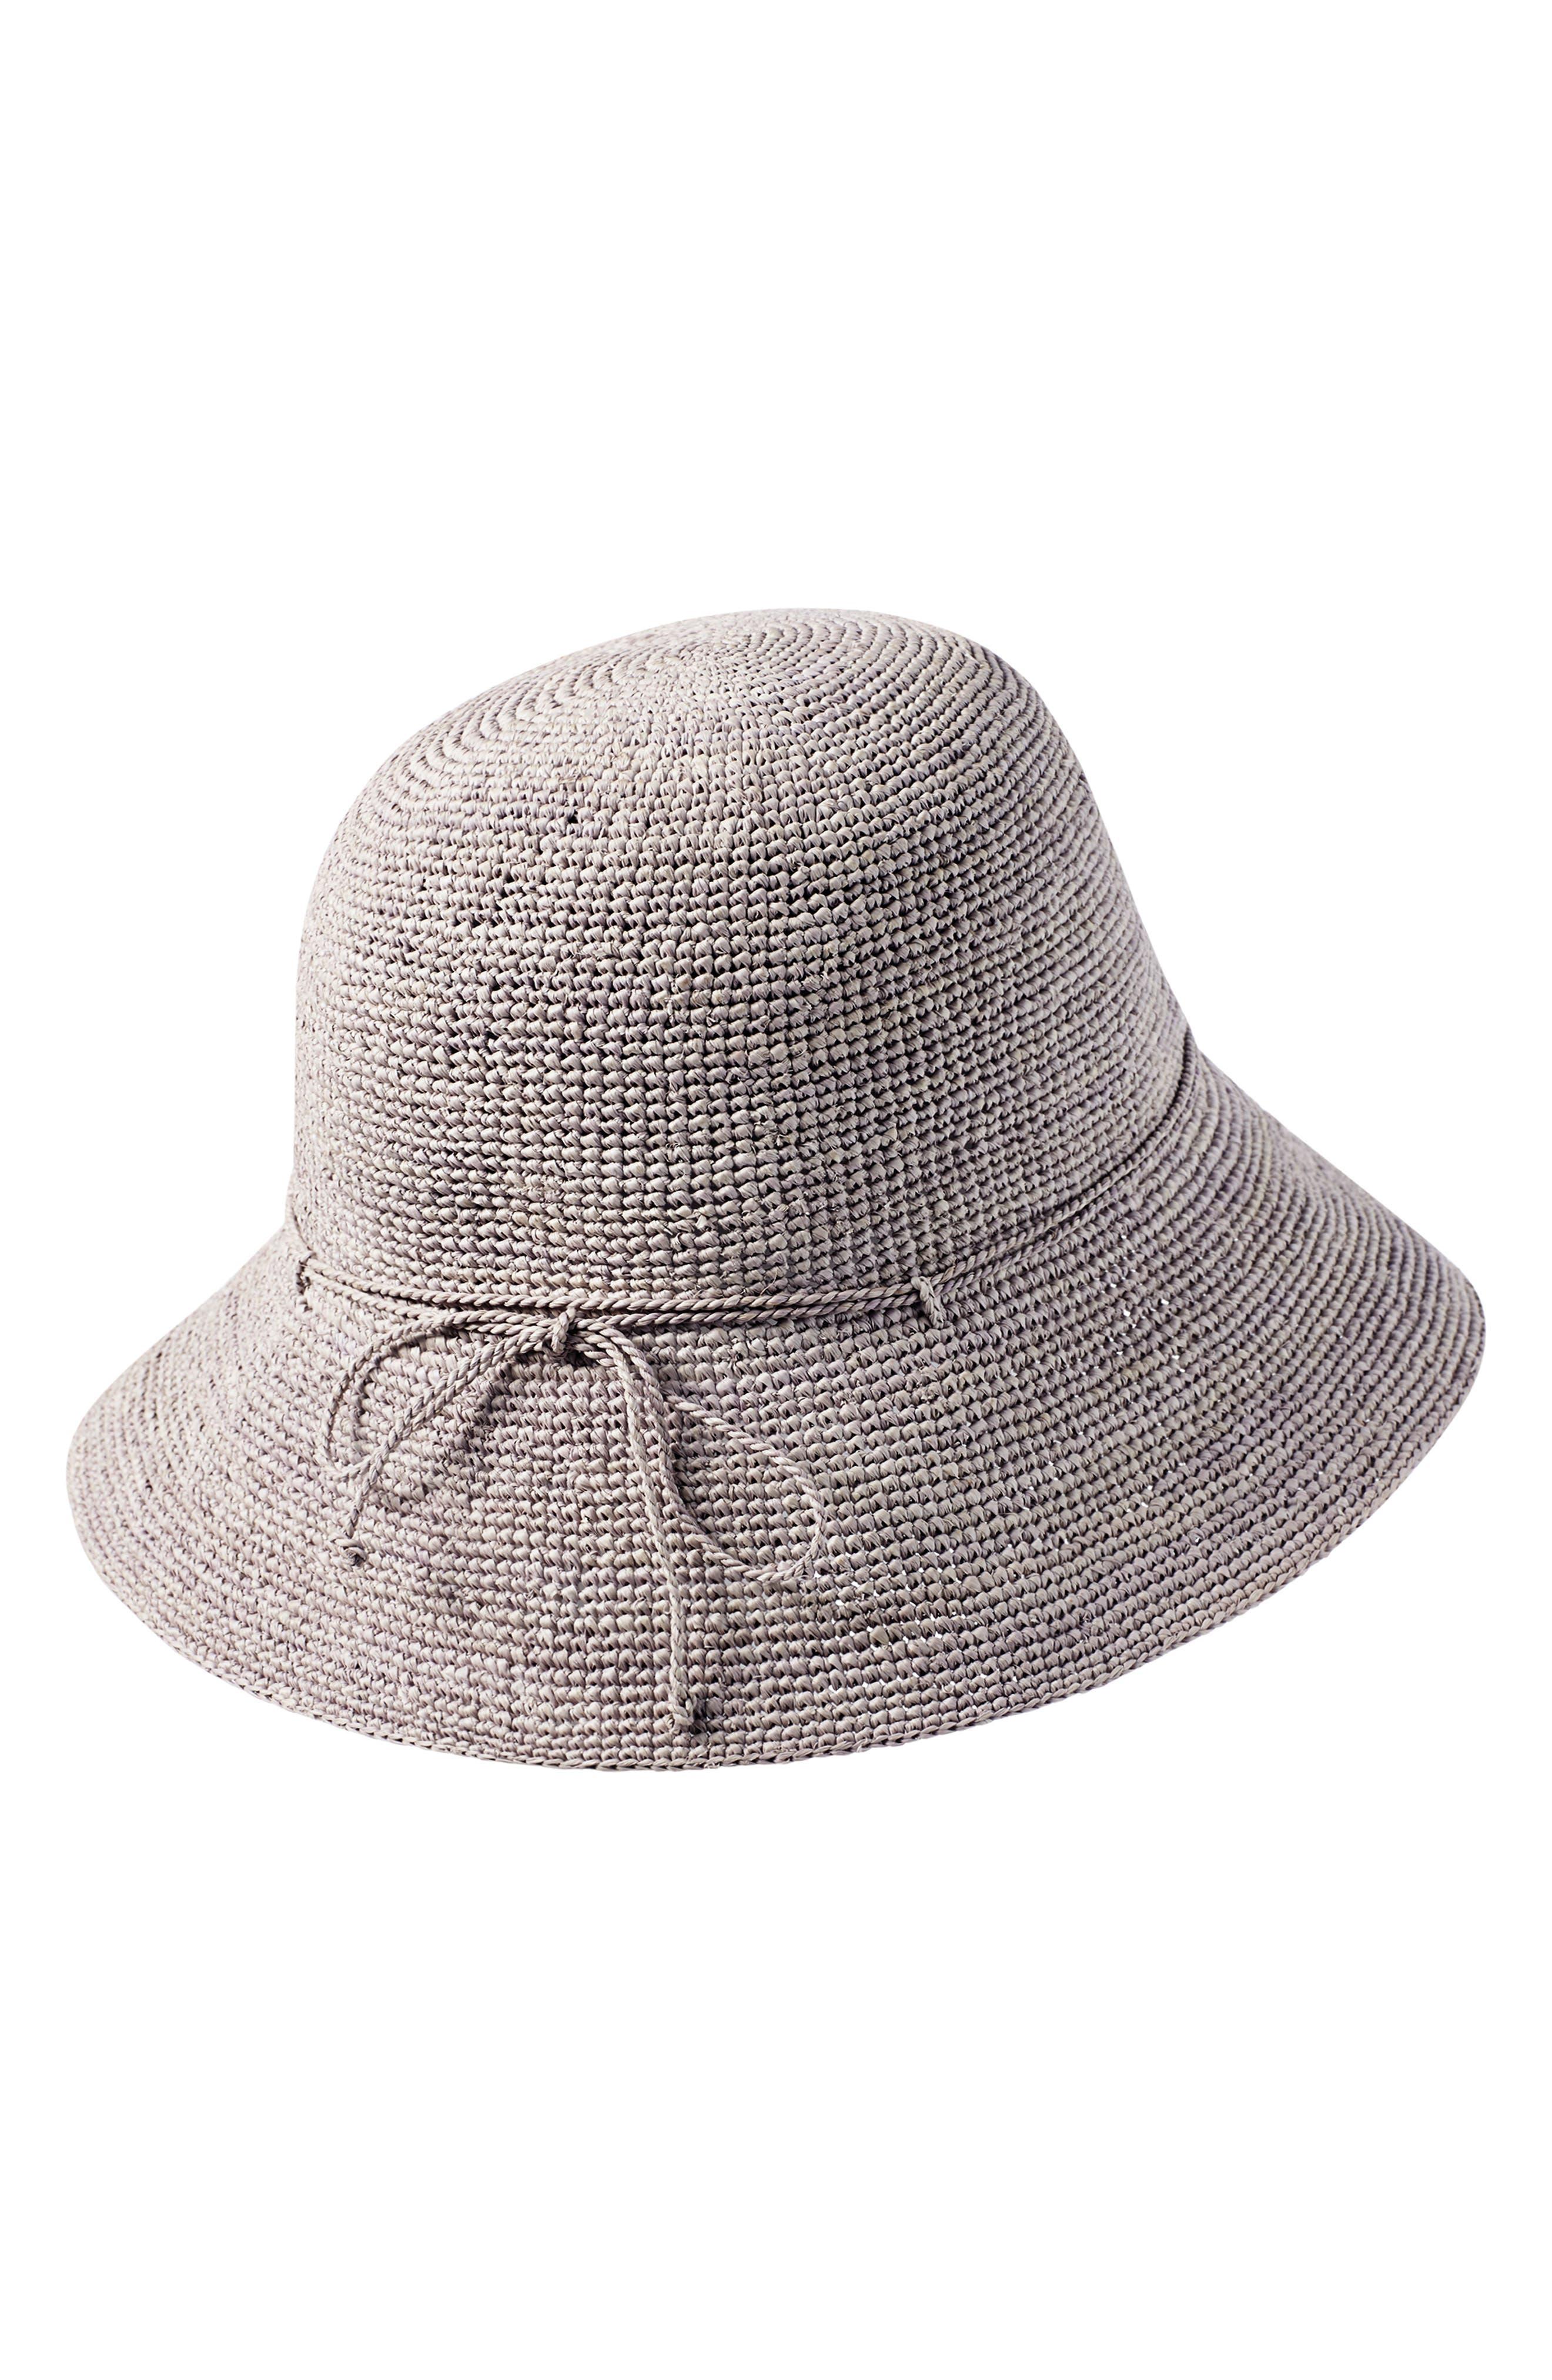 8313c48f Women's Sun & Straw Hats | Nordstrom